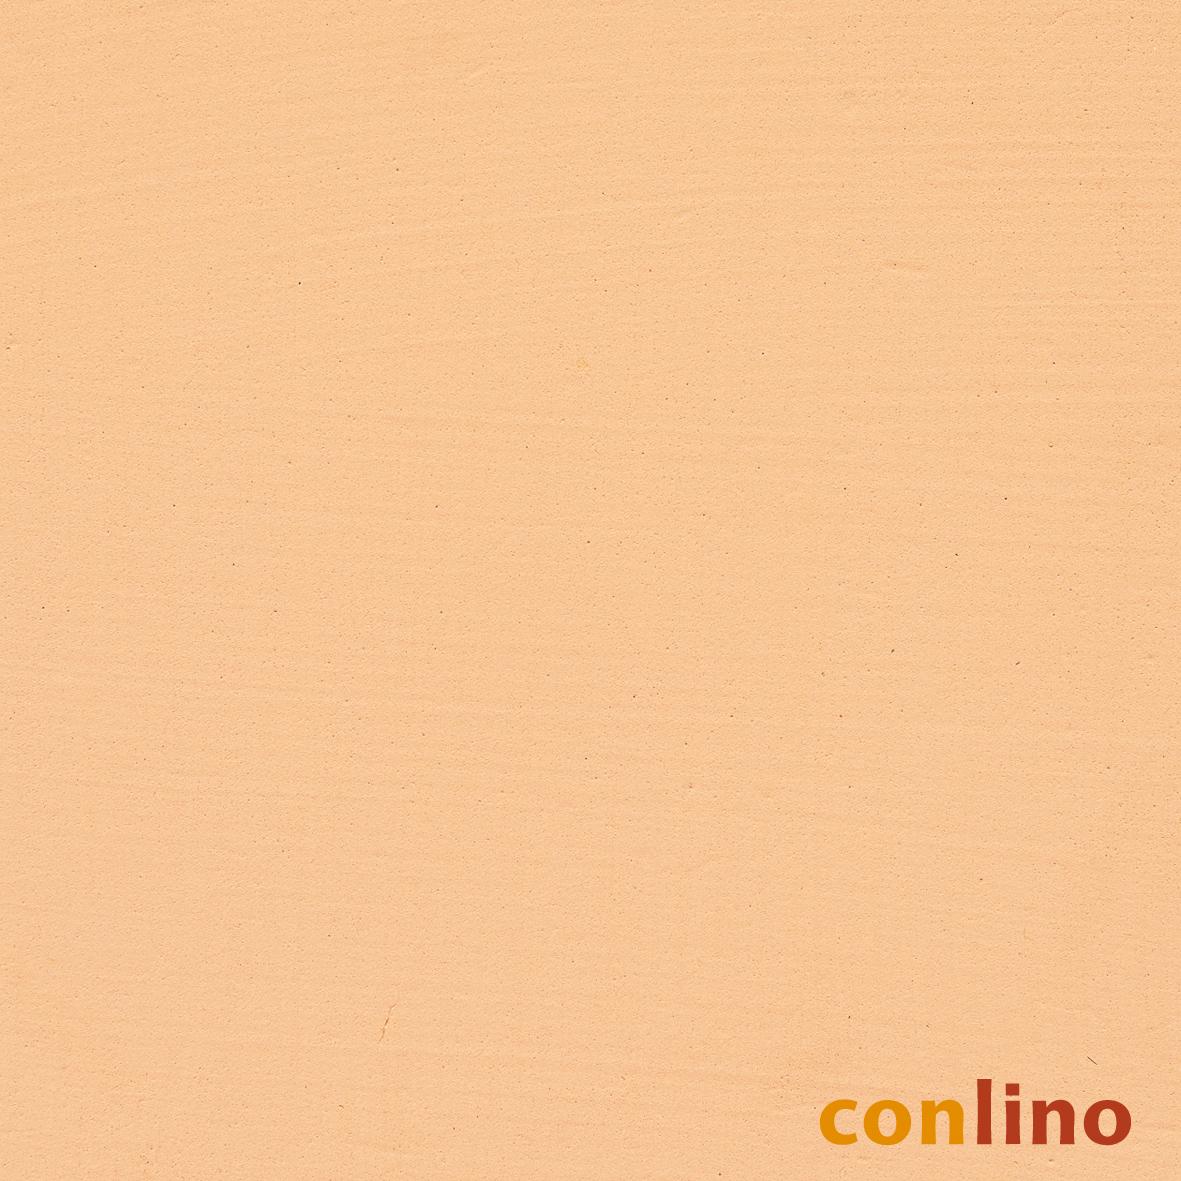 conlino Lehmfarbe Marokkogelb CL 124